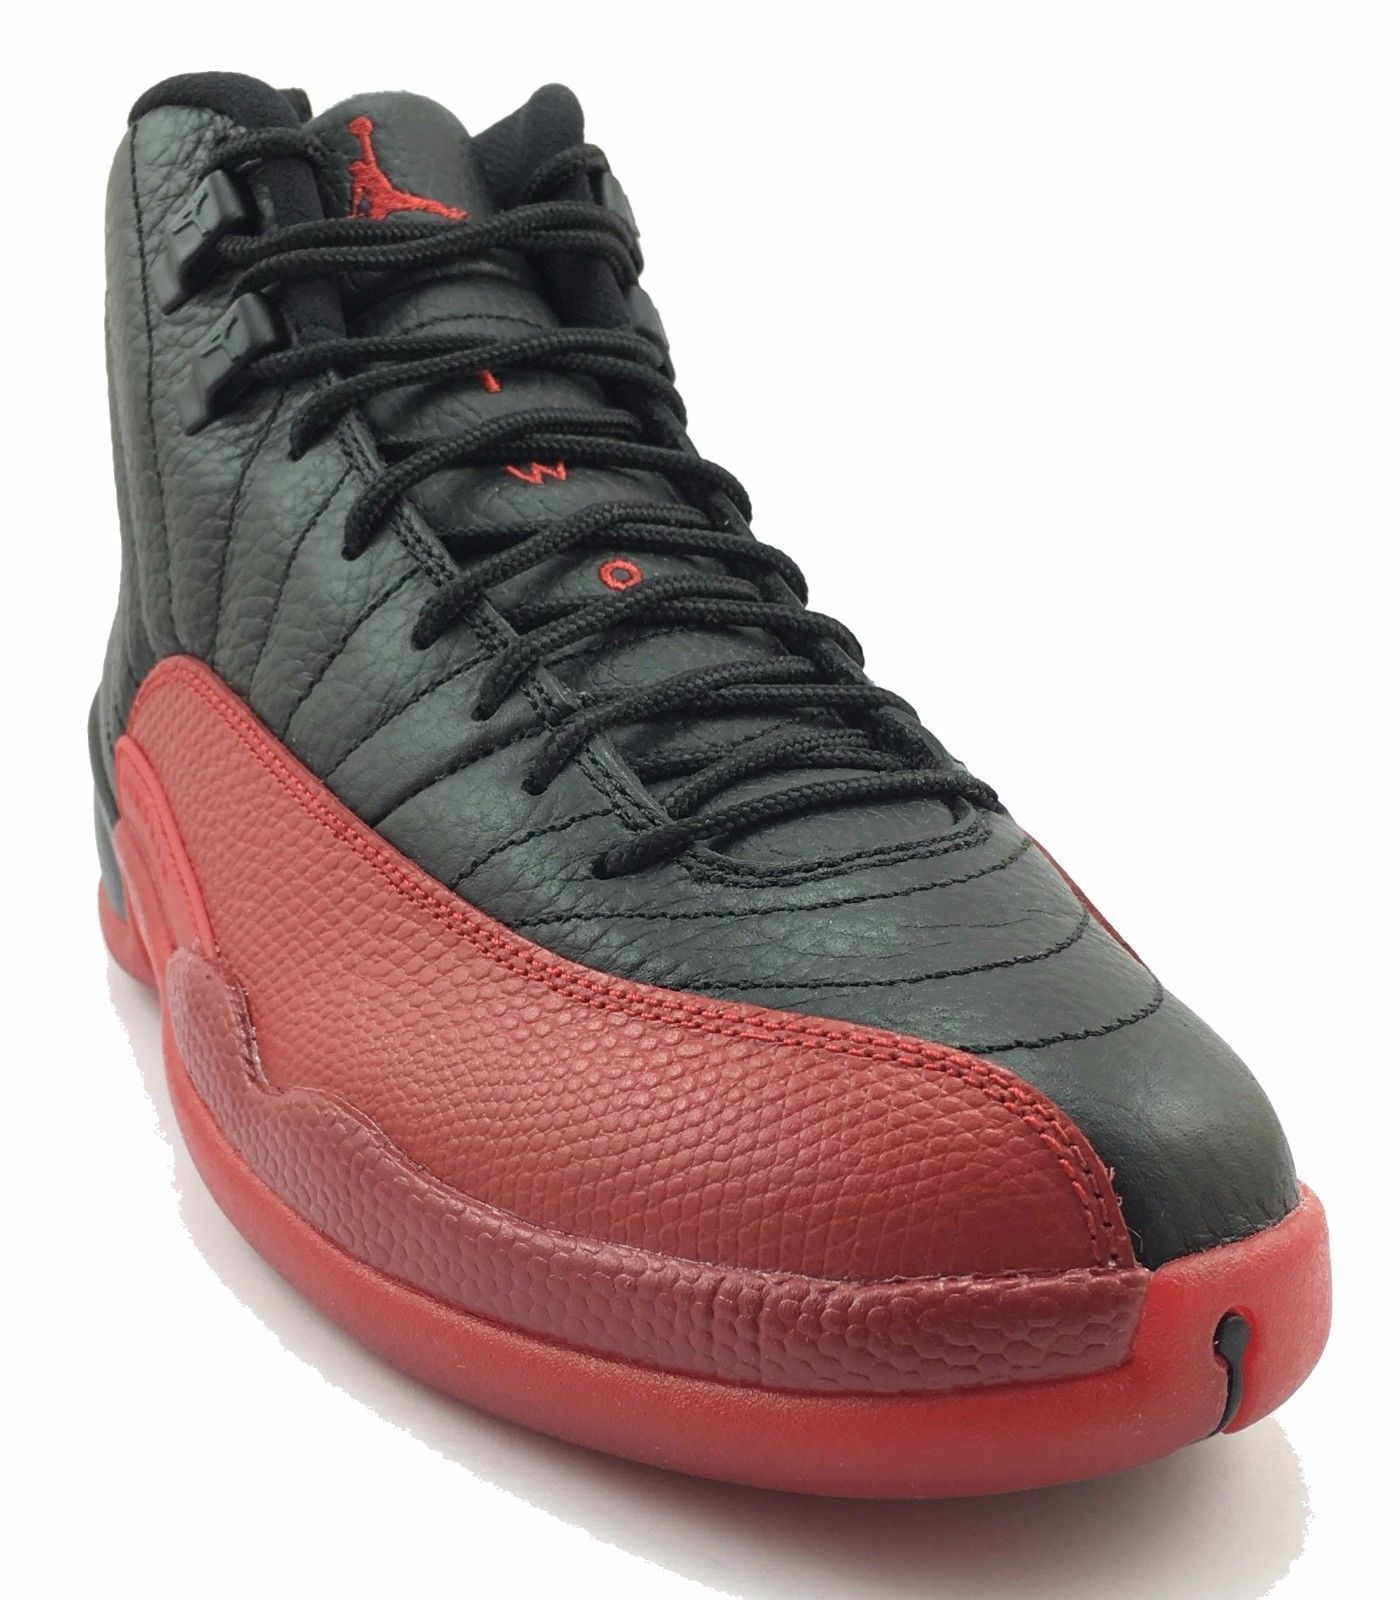 35a5c164711e51 Details about Nike Air Jordan Flu Game 12 Retro XII 130690 002 ...